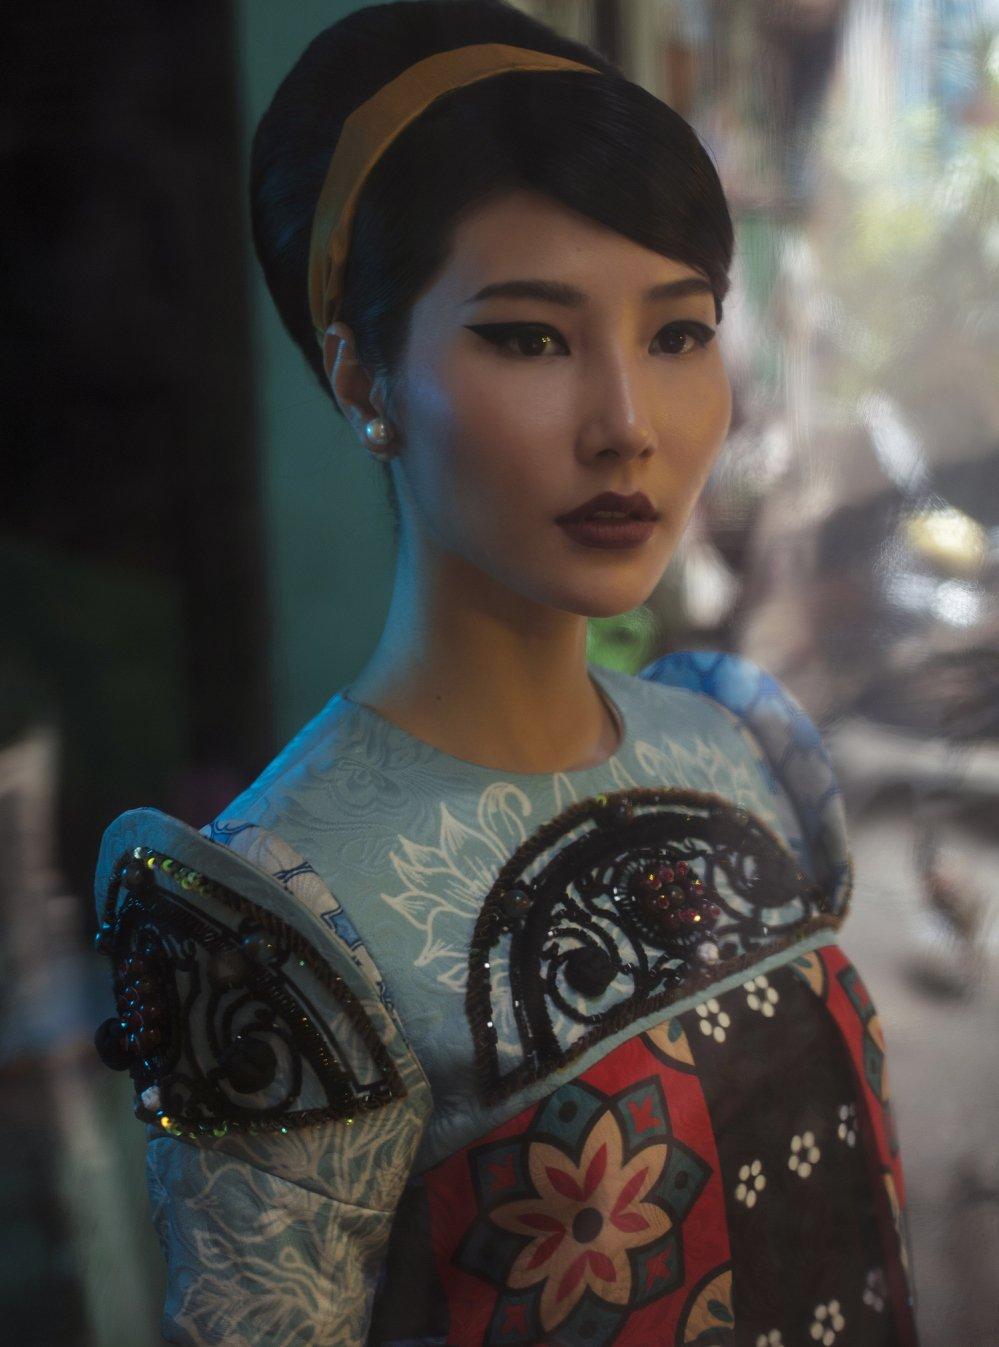 Ninh Duong Lan Ngoc, Diem My 9x dien ao dai tai hien hinh anh Sai Gon xua hinh anh 4